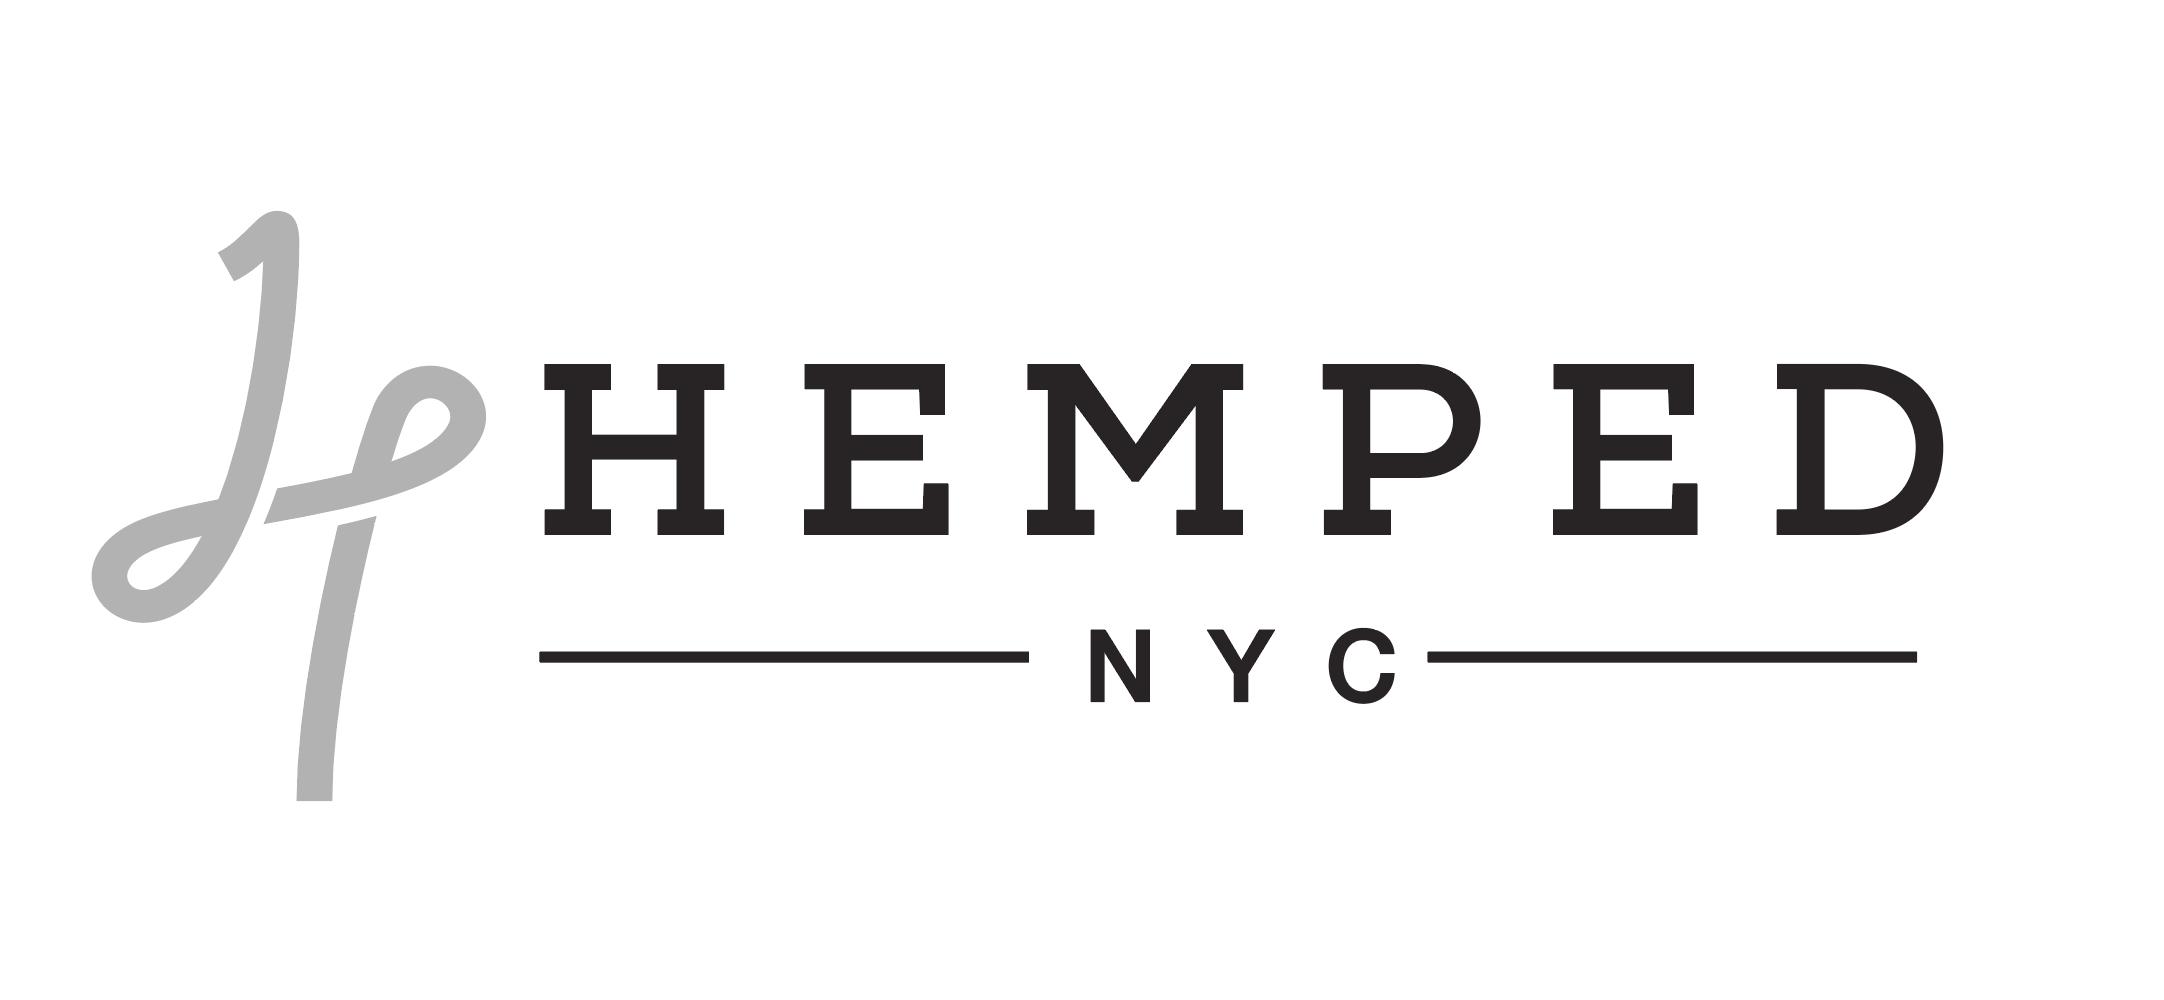 Hemped NYC